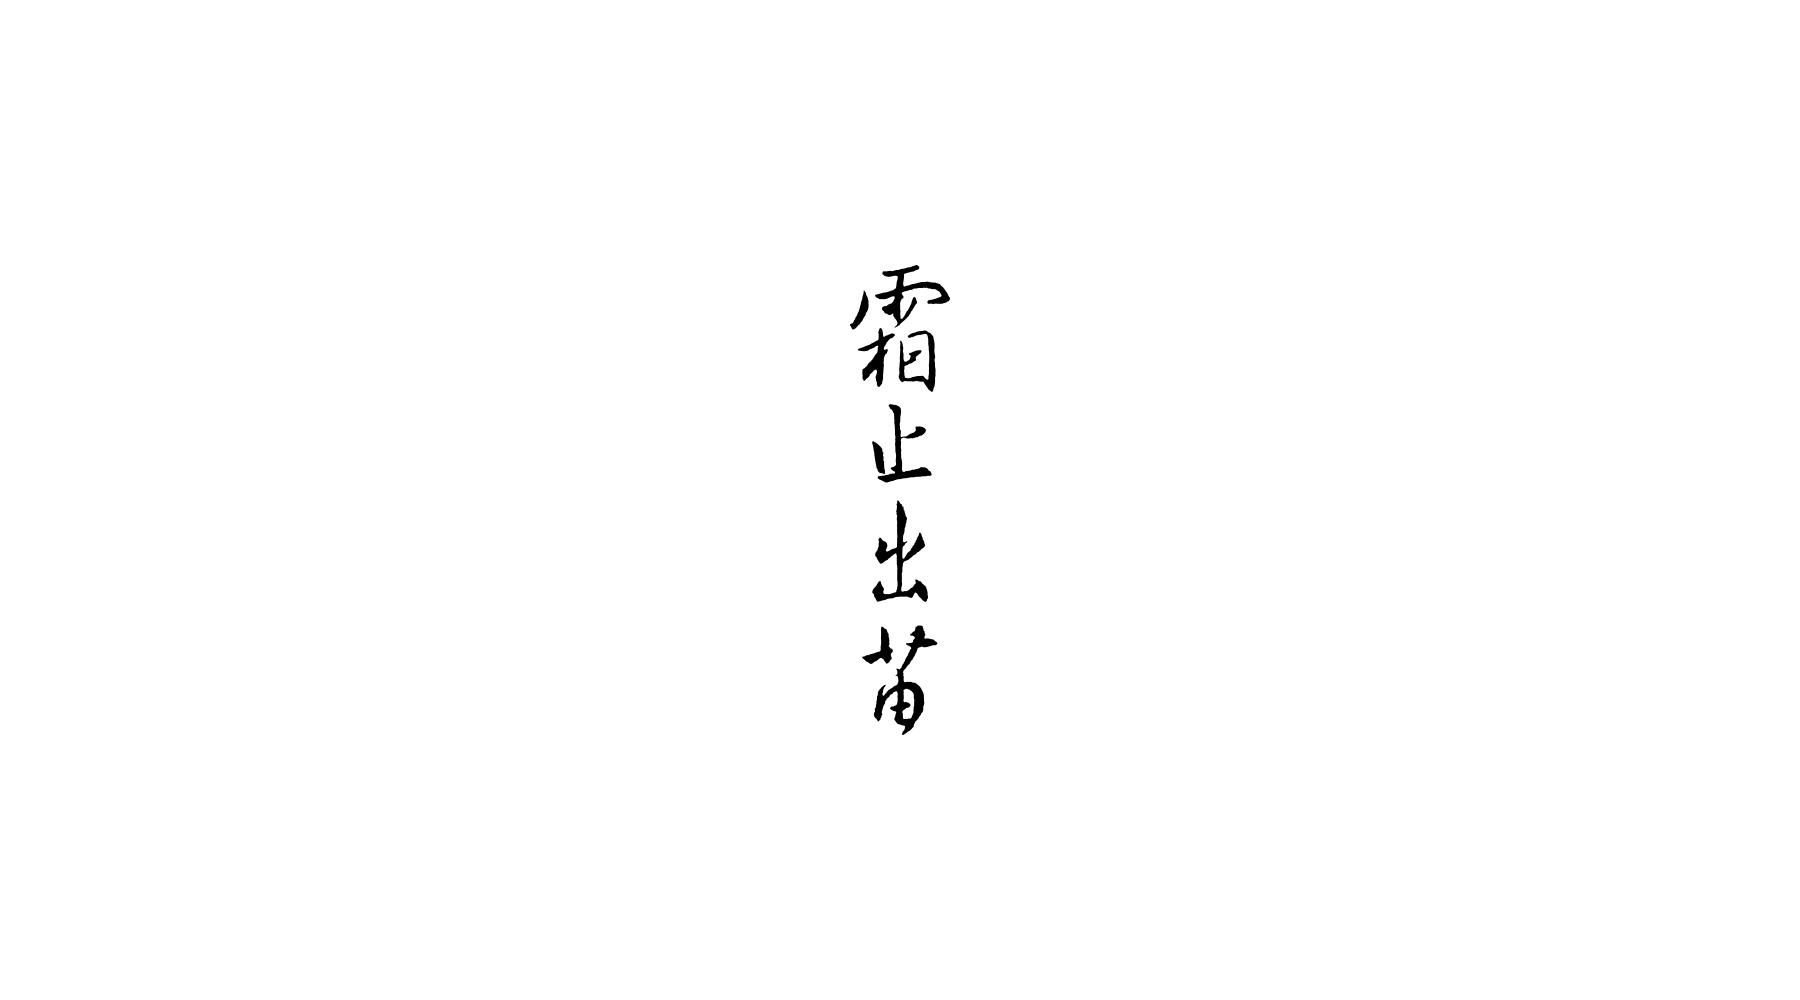 Shimoyamite Naeizuruの1枚目のカバー写真